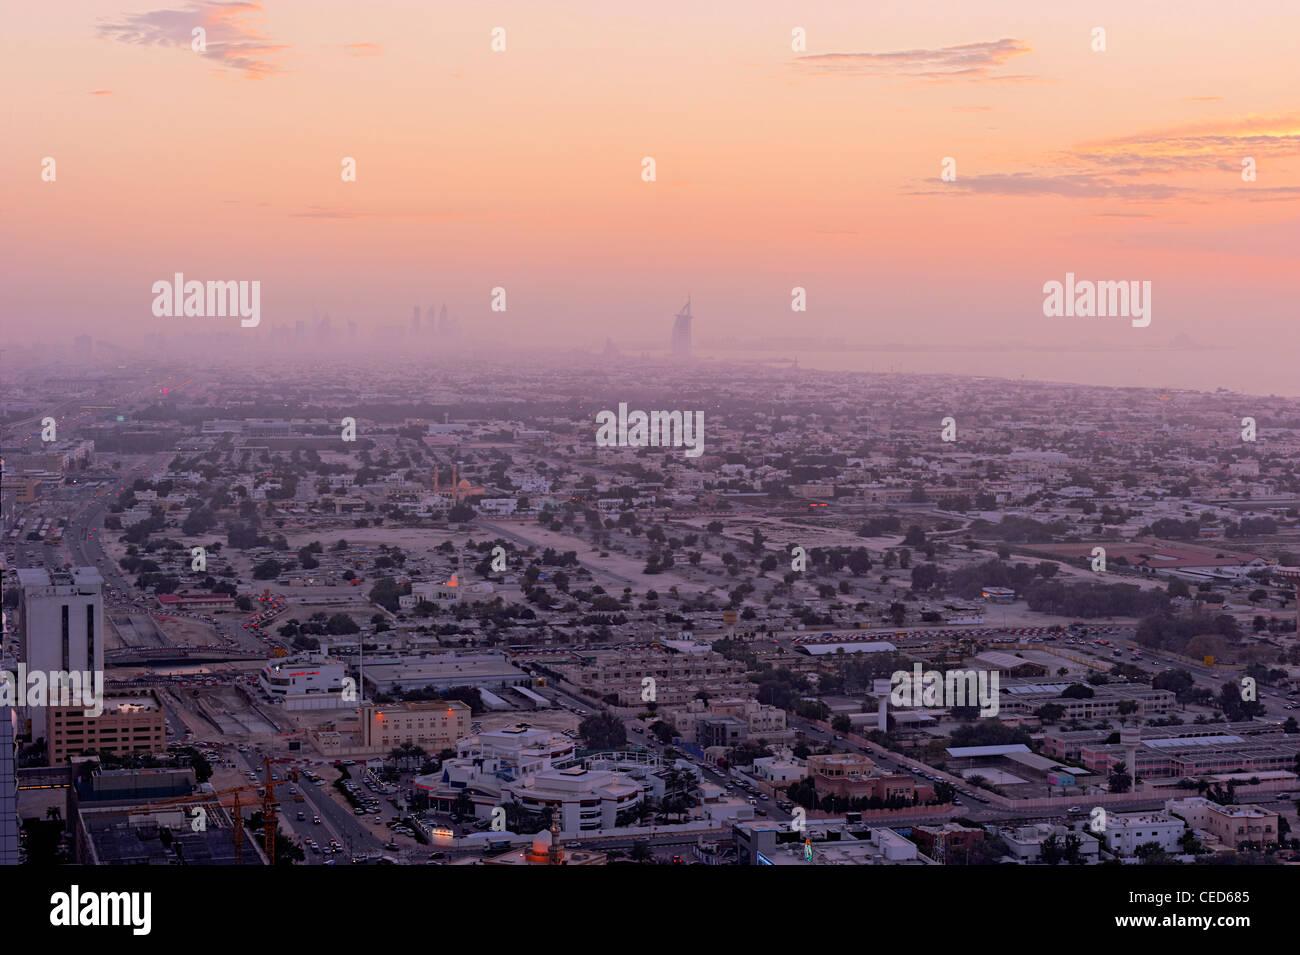 Sunset at the Persian Gulf, megacity, Jumeirah, Dubai, United Arab Emirates, Middle East - Stock Image